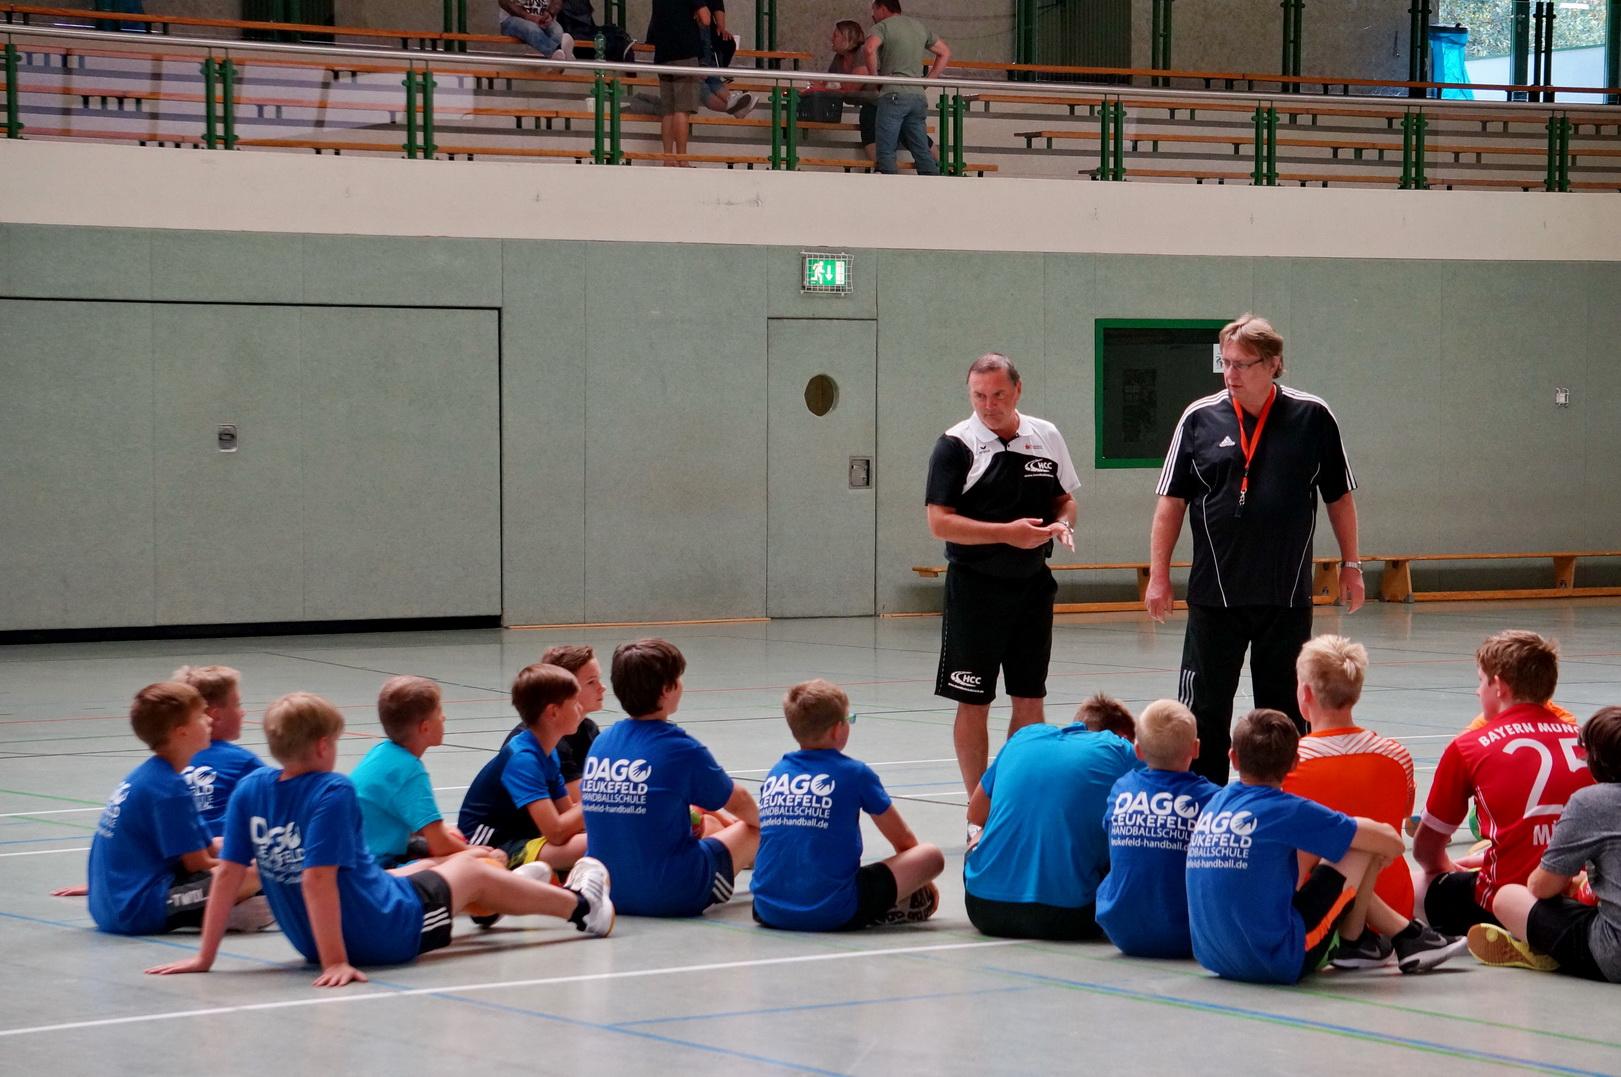 201808_Handballcamp_SDH_MG_138w